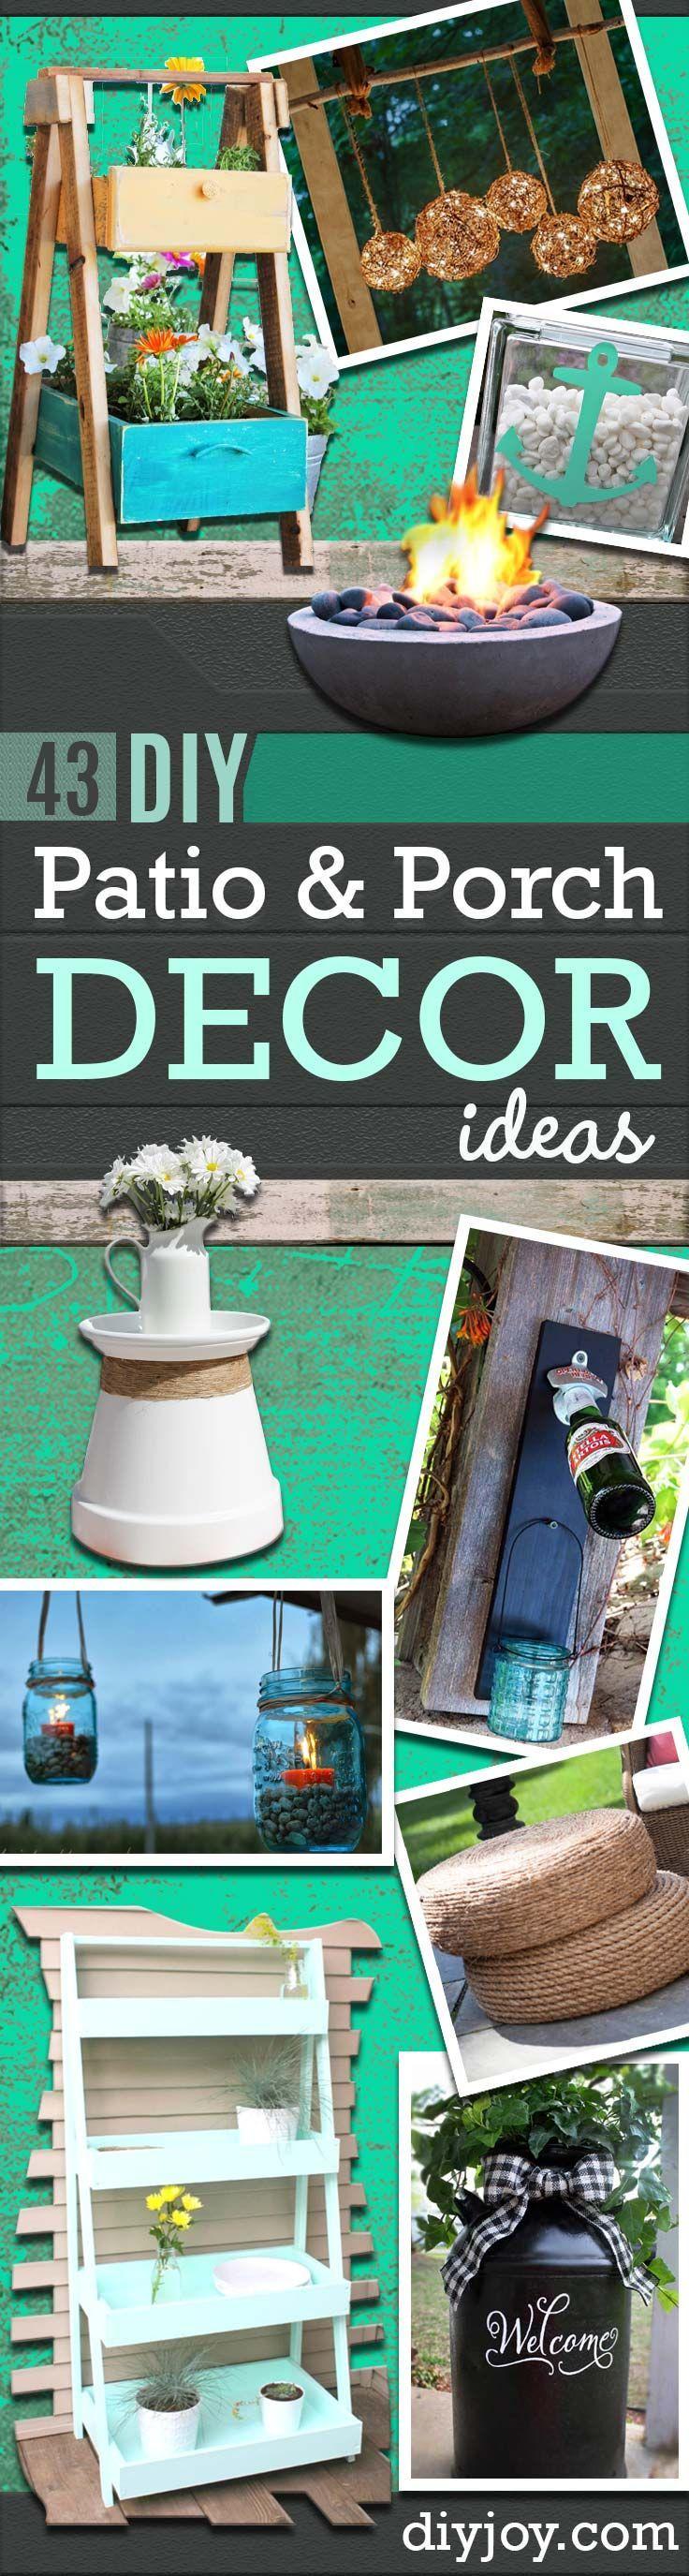 Diy Yard Projects Best 25 Diy Porch Ideas Only On Pinterest Diy Decks Ideas